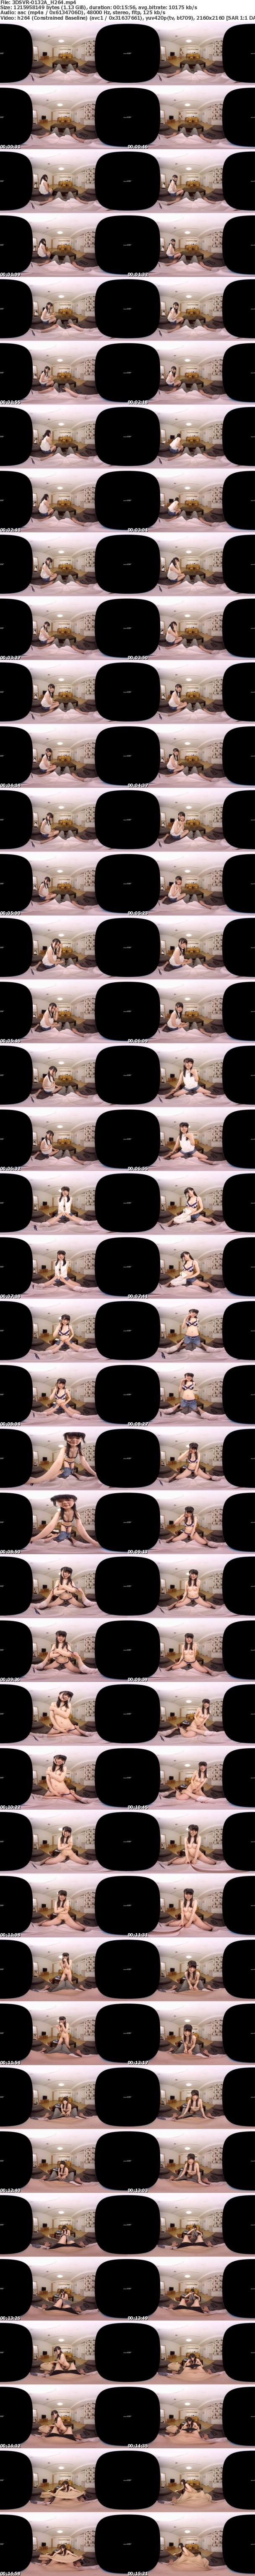 VR/3D 3DSVR-0132 【VR】VR長尺 デリヘル呼んだら風俗初出勤の女子大生。おもちゃオプションでイカせまくってグチョグチョになった新人ヌレヌレま○こに「お店には内緒だよ」とにゅるんと生挿入してそのまま中で発射!